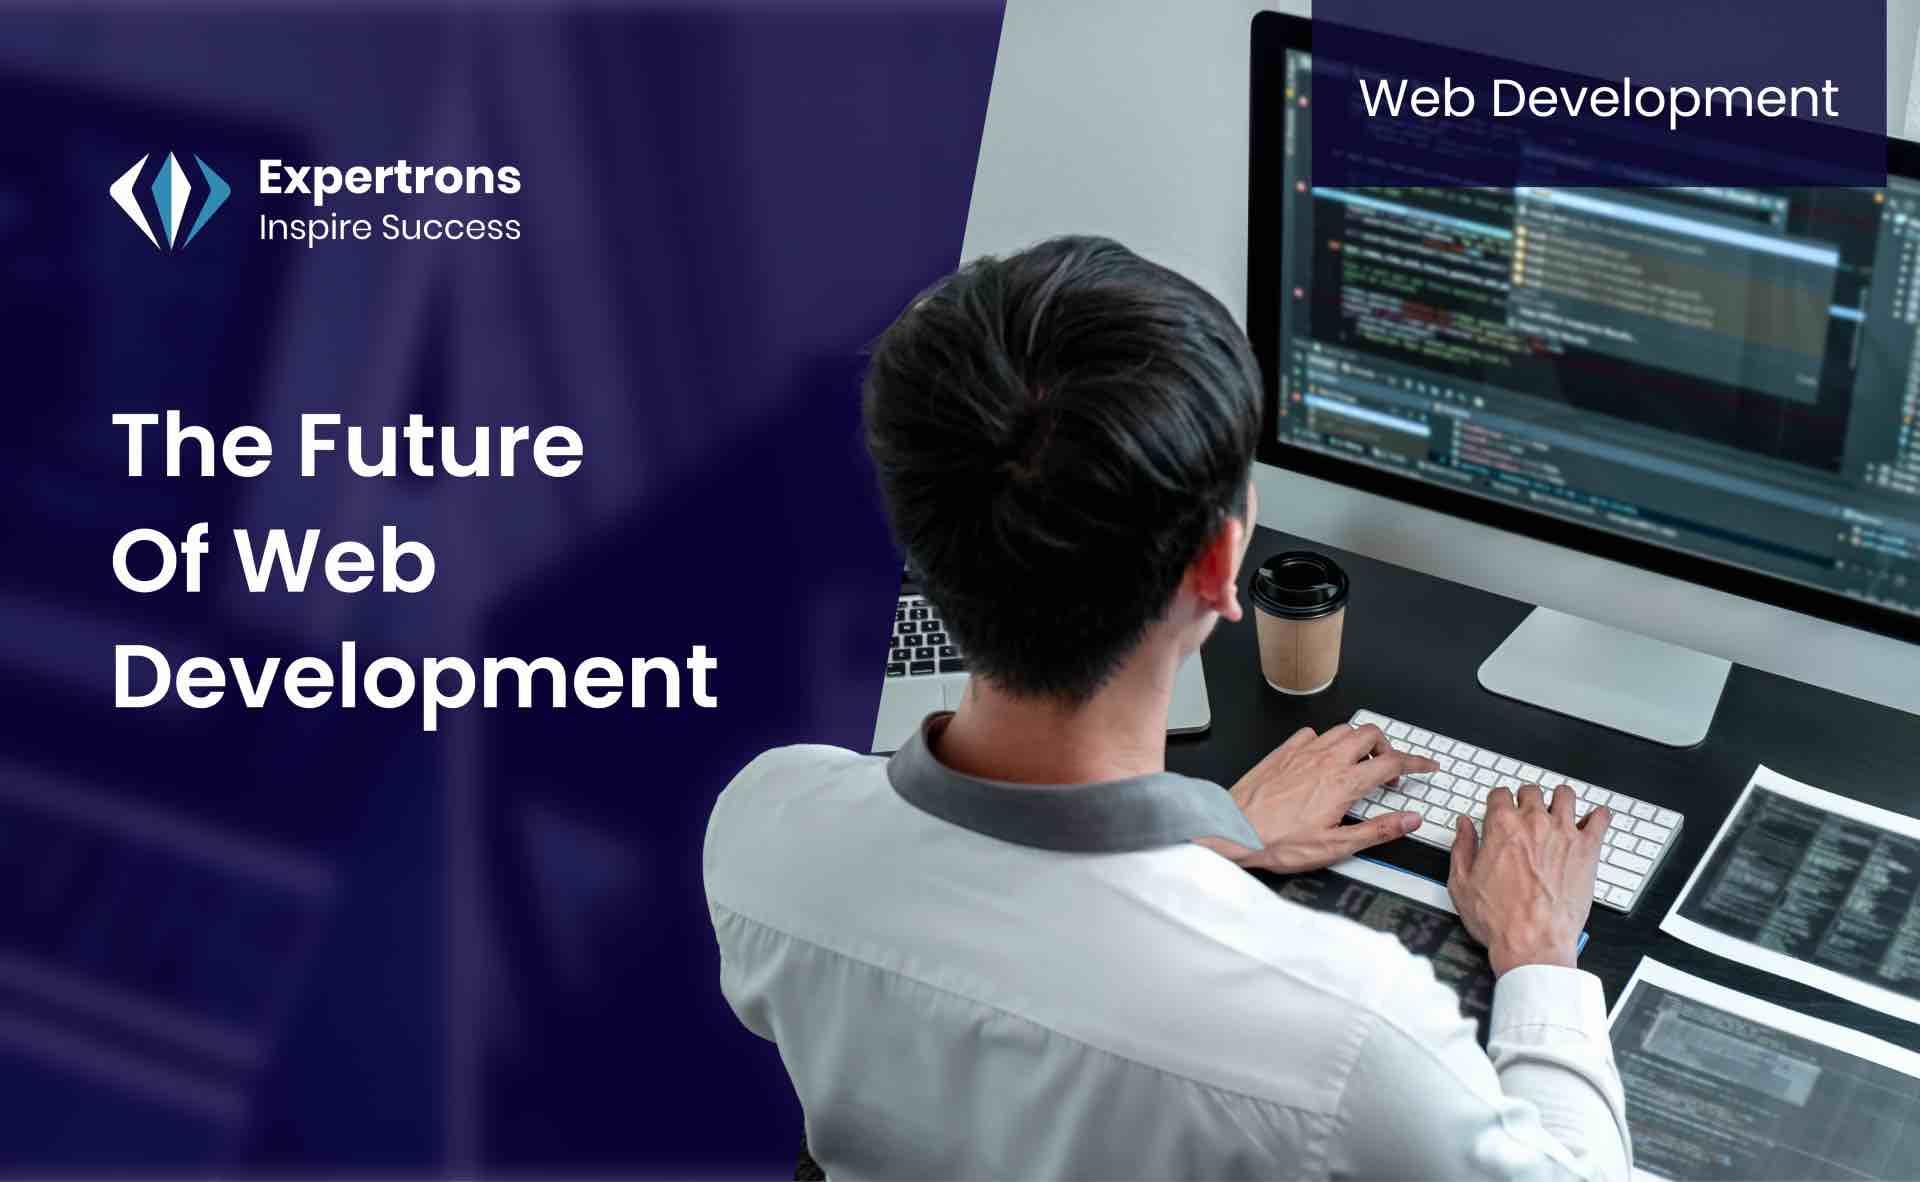 future of web development, internet of things iot